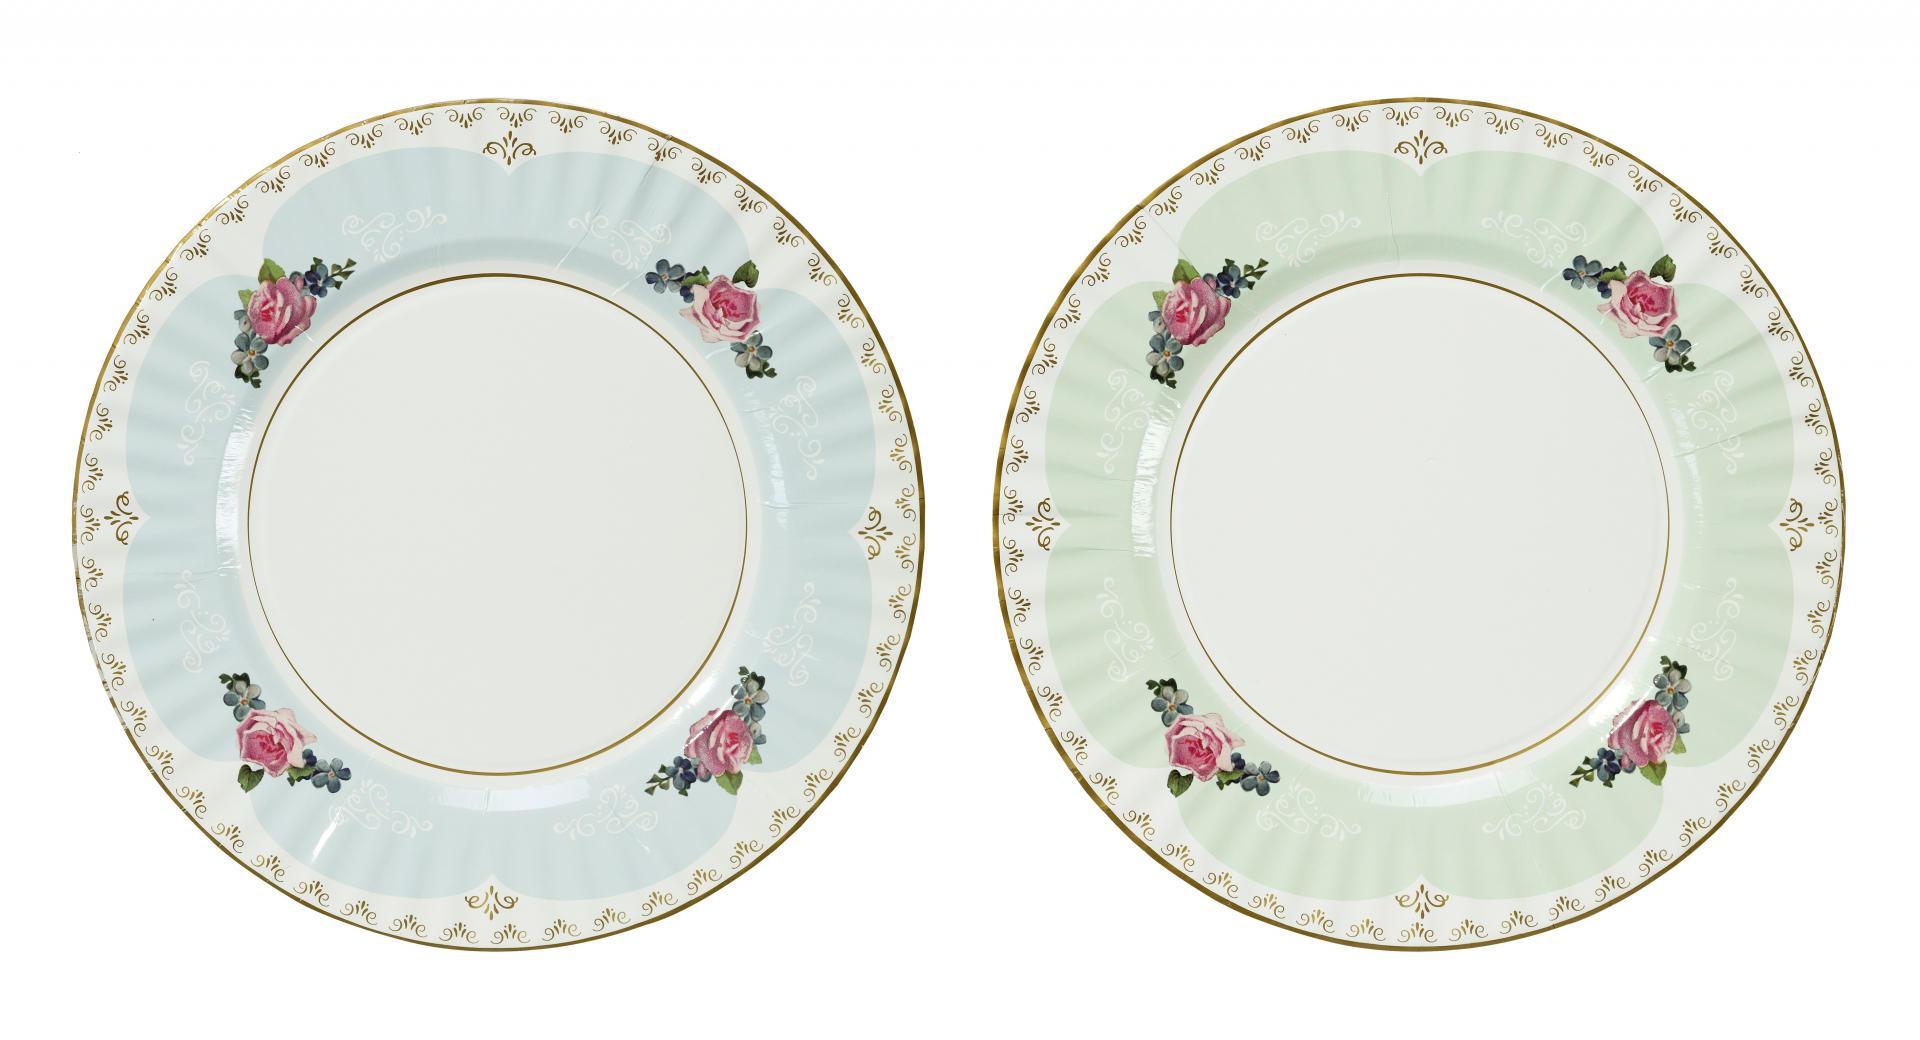 Talking Tables Velké papírové talíře Truly Scrumptious - set 8 ks